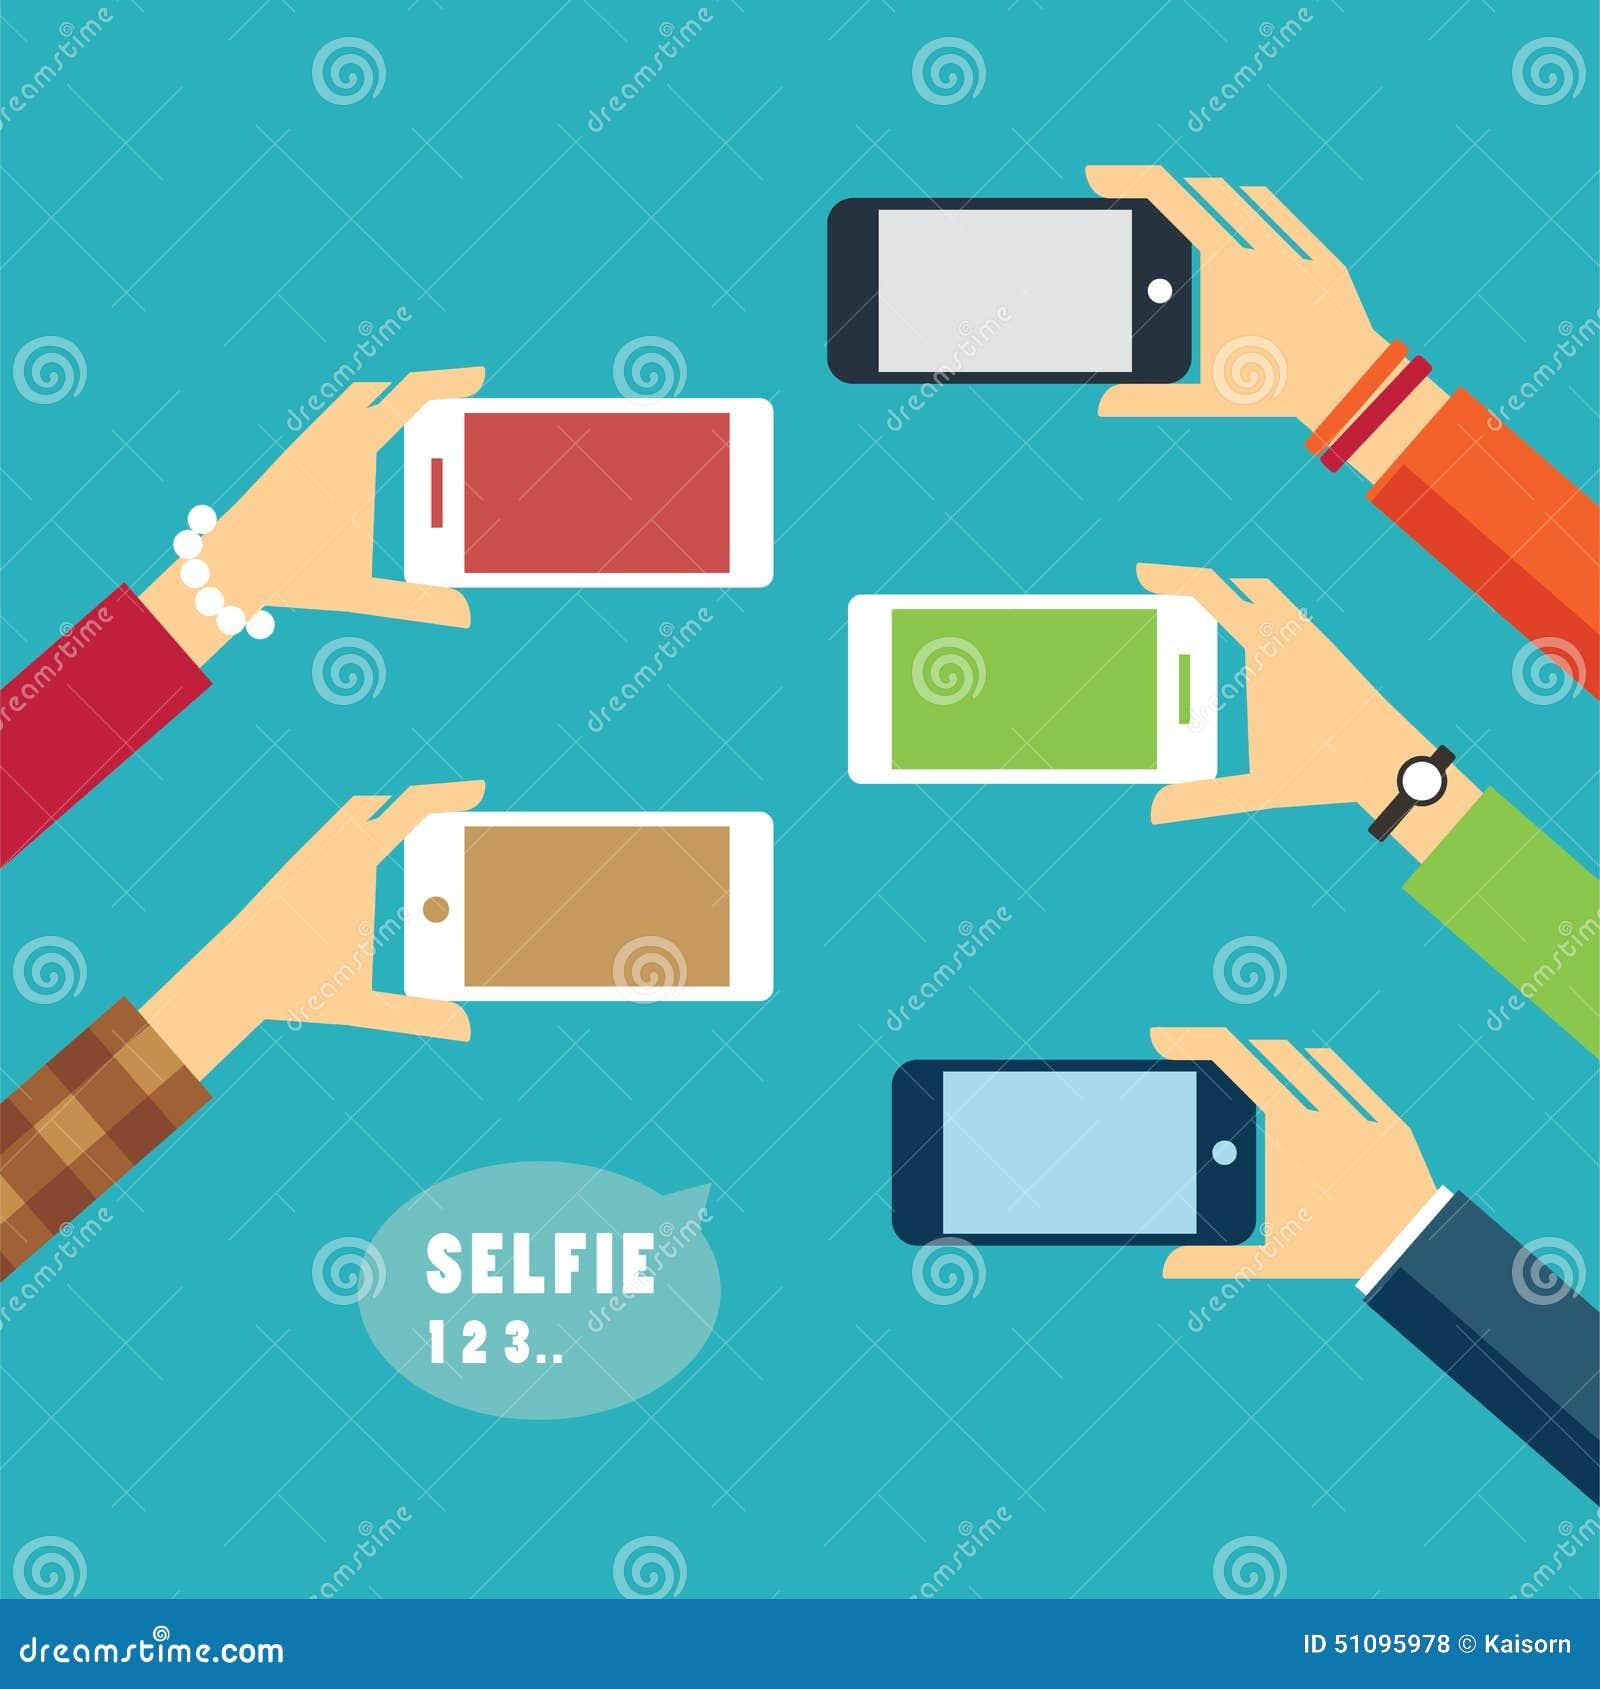 Taking A Selfie Photo Flat Design Stock Vector - Image: 51095978